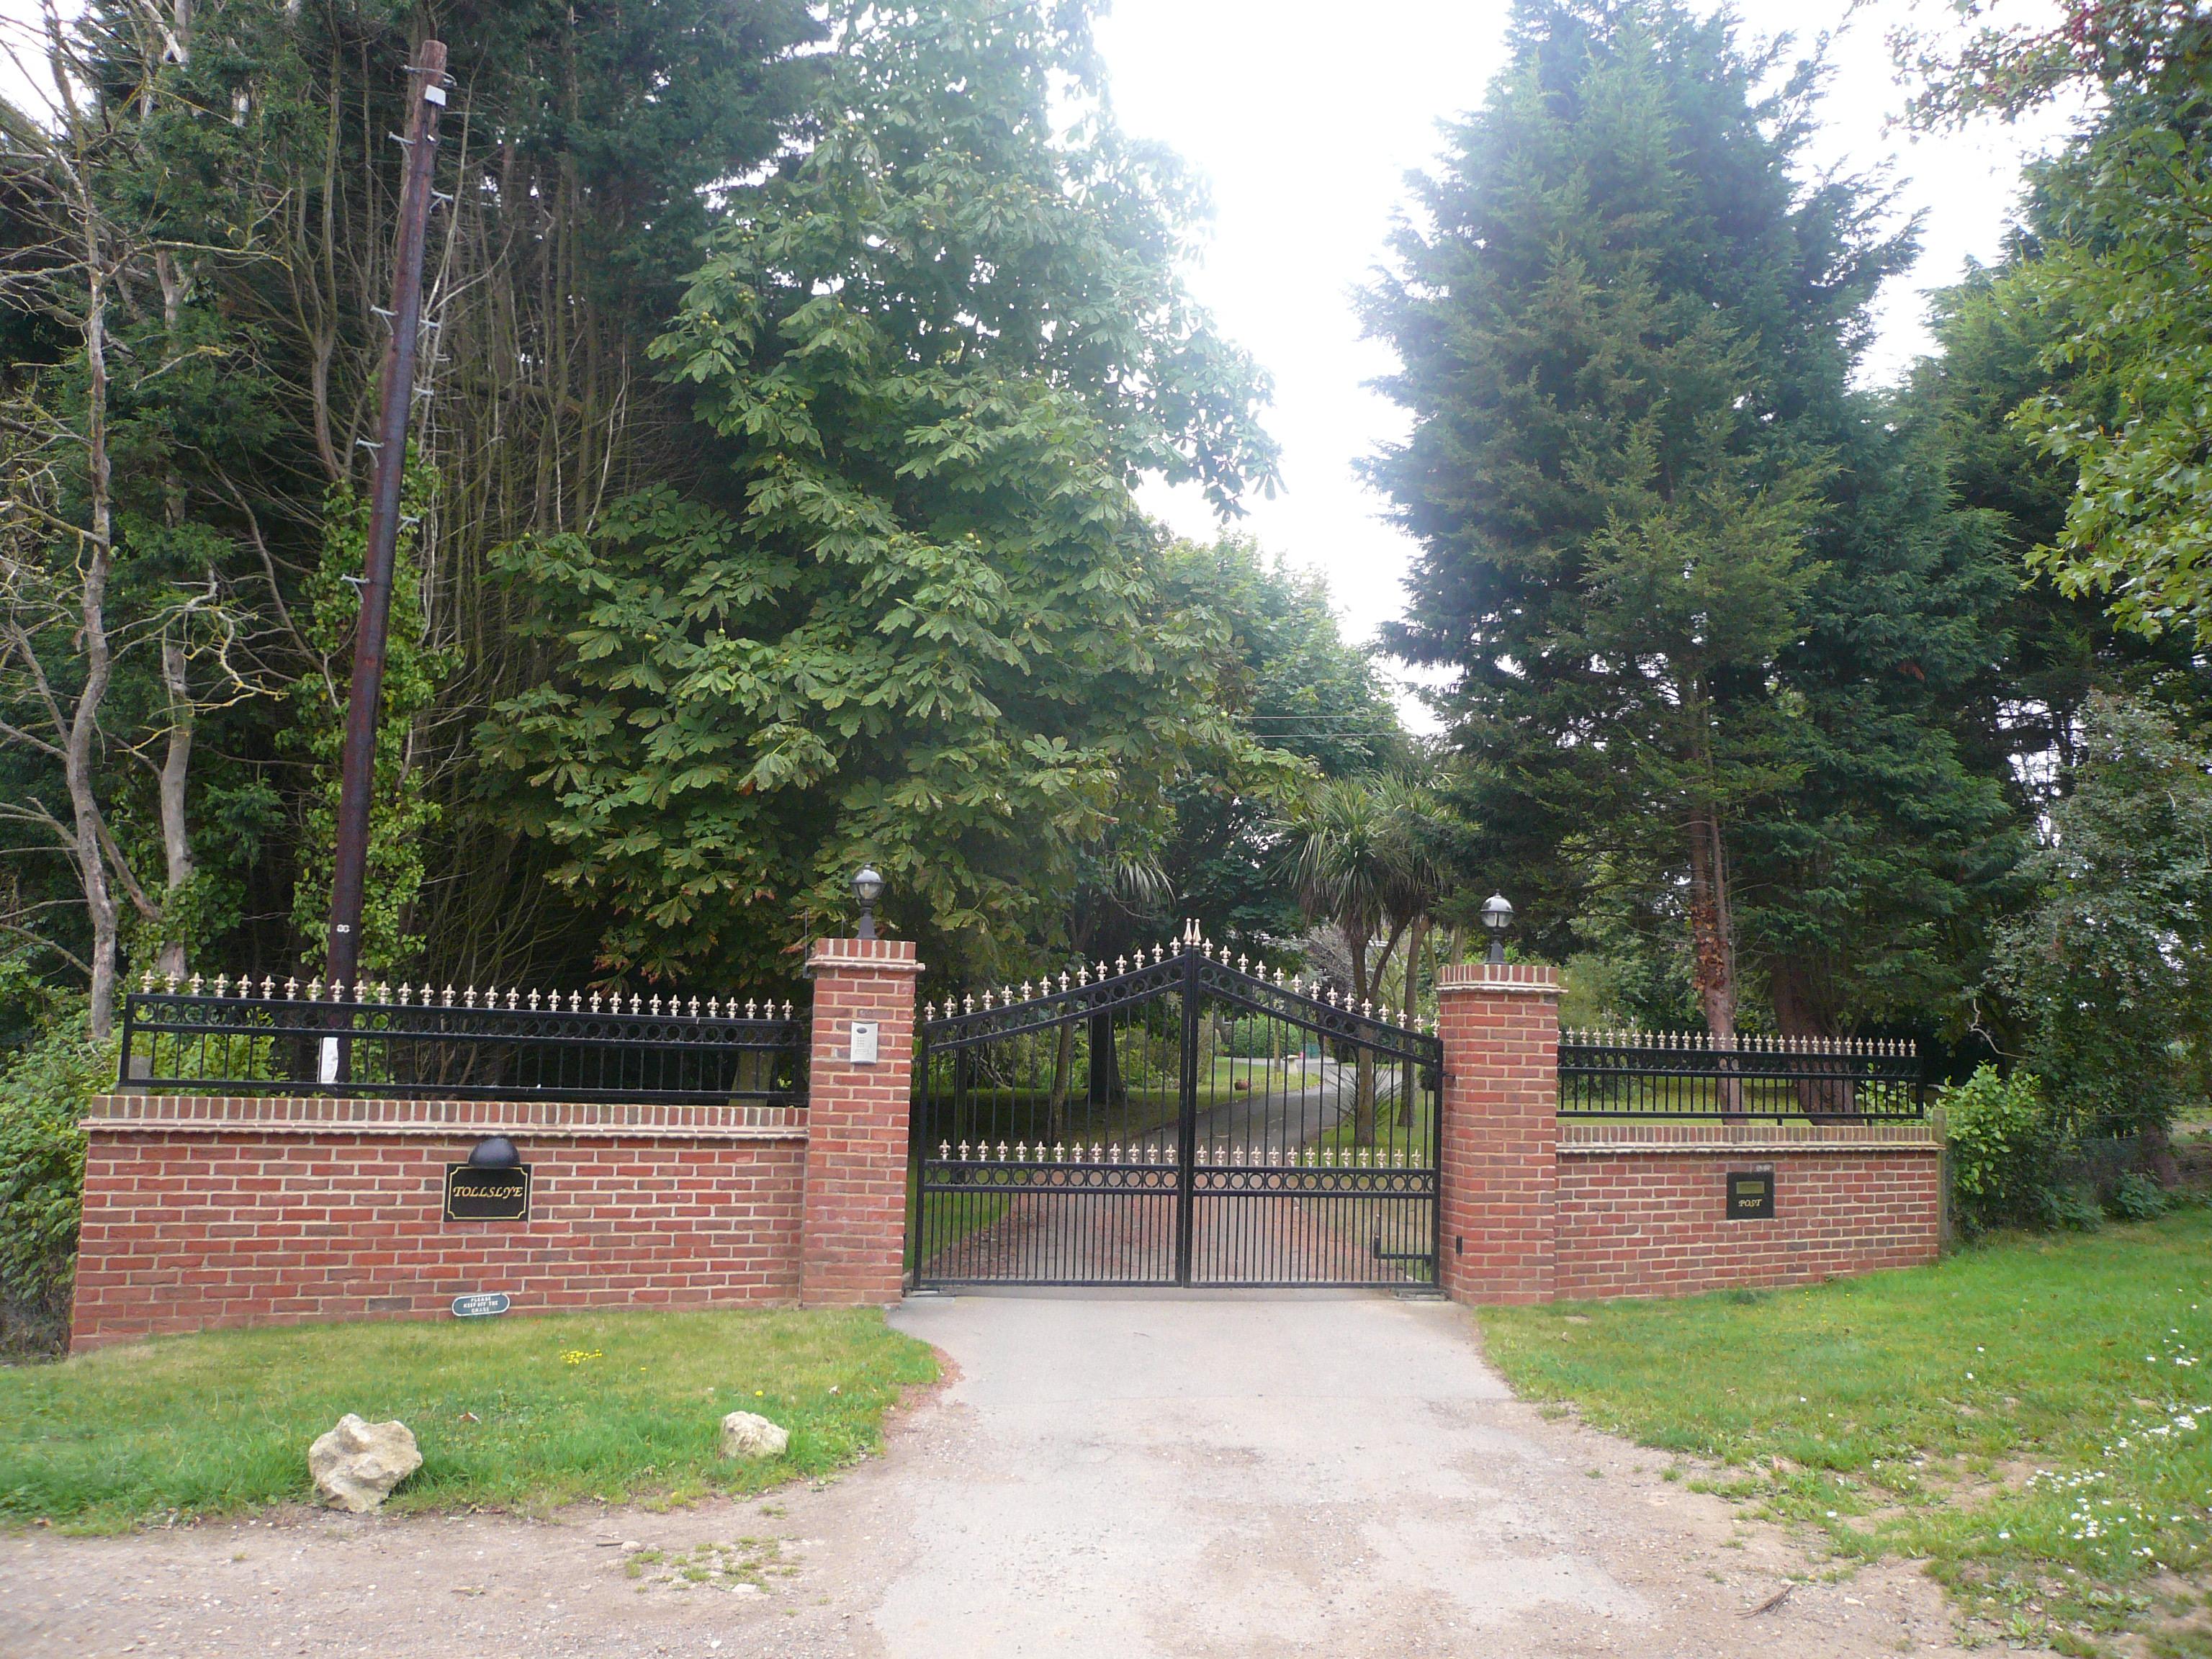 File:Blackwater Tollslye House entrance.JPG - Wikimedia Commons